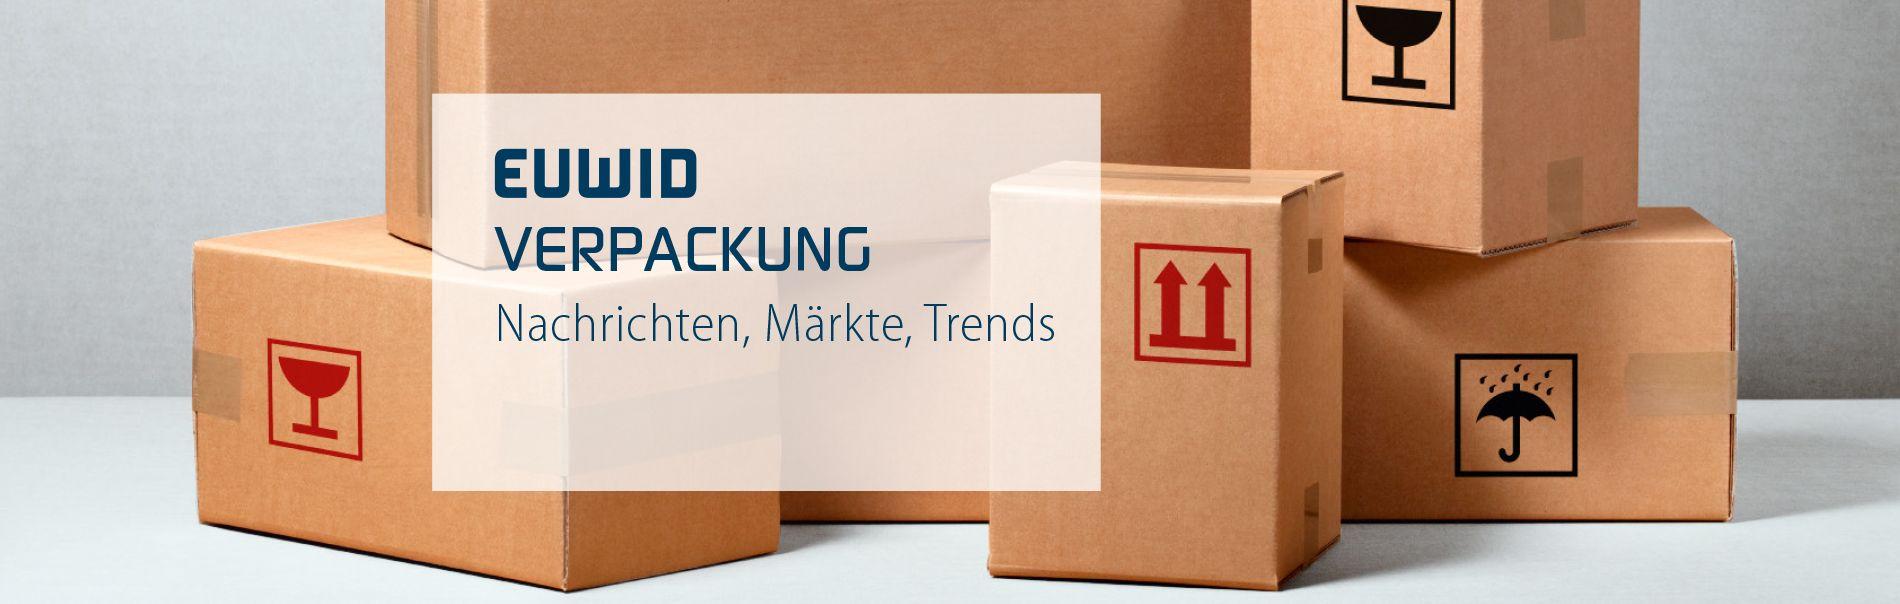 Slider EUWID Verpackung, Kartonagen & Logistik